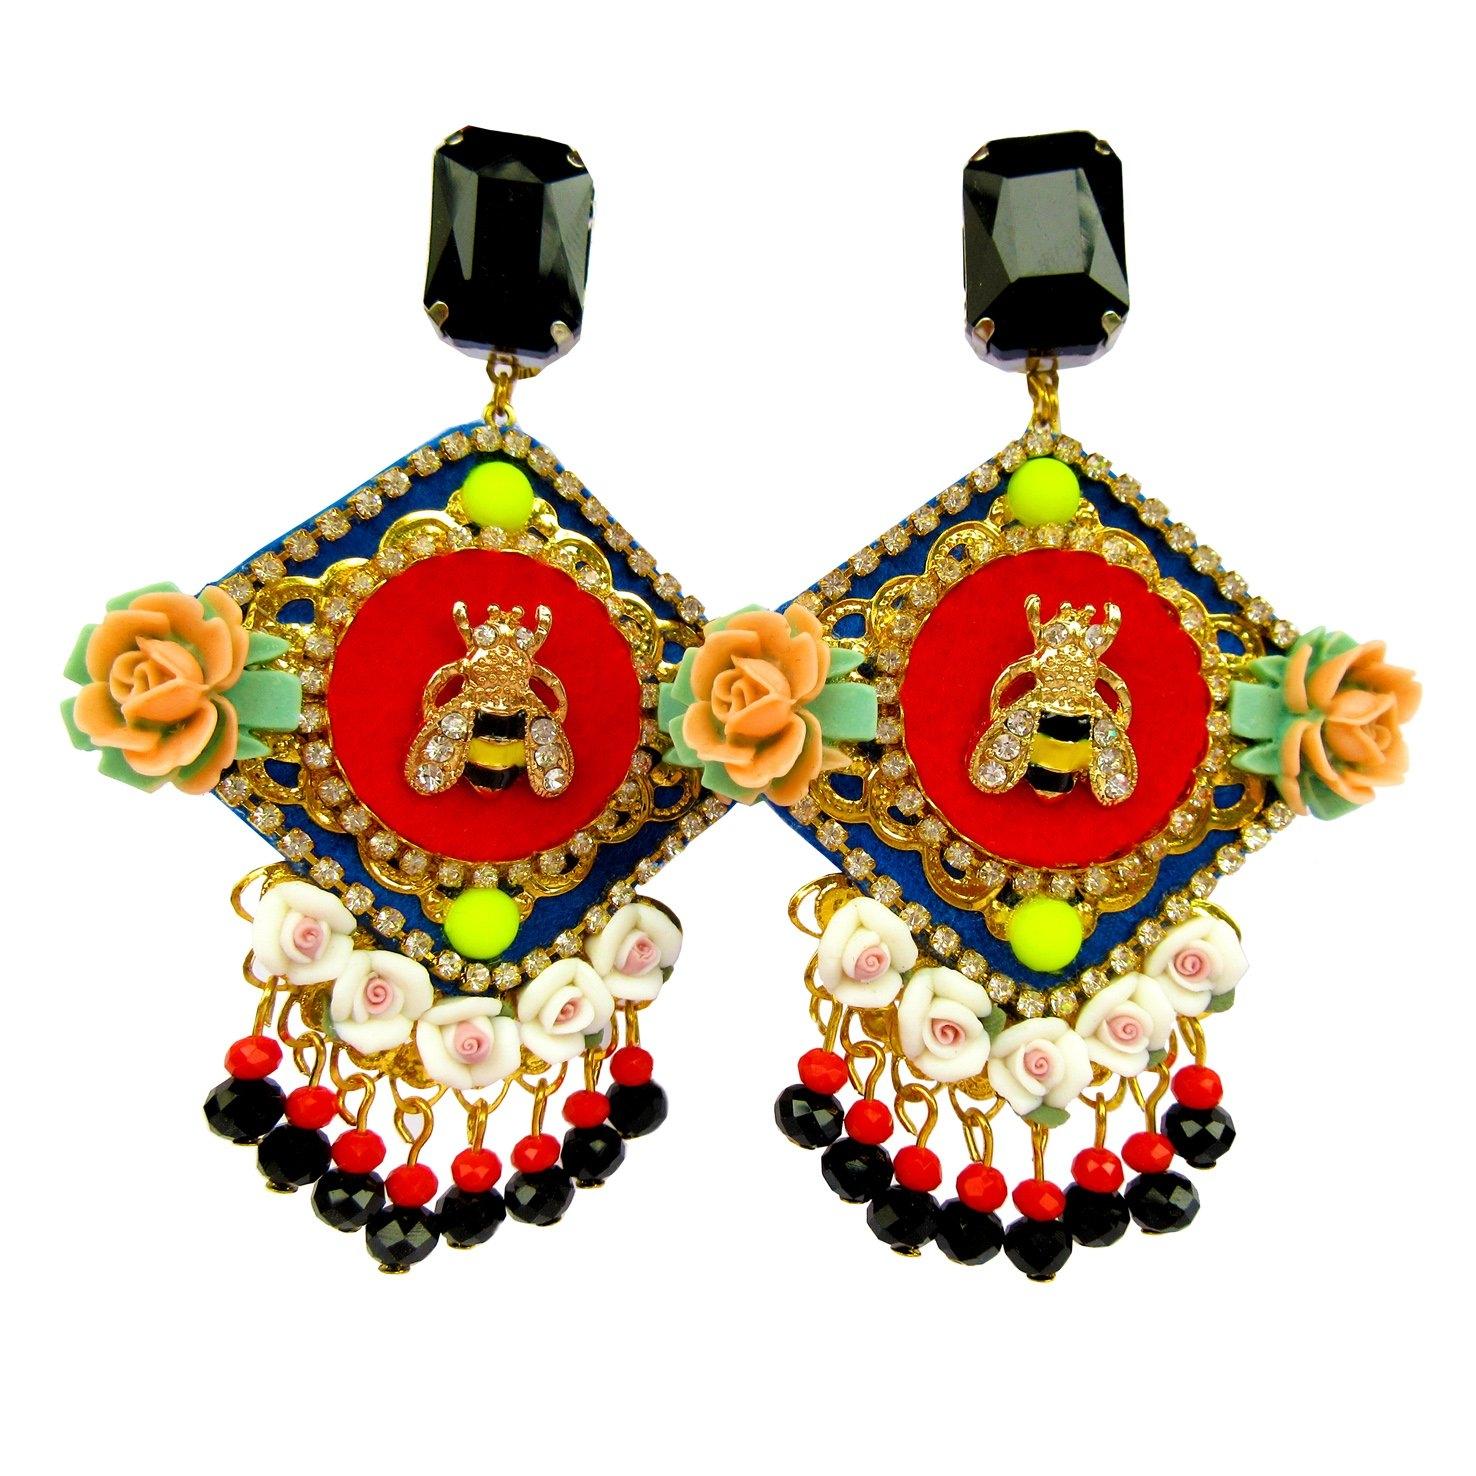 mouchkine-jewelry-earrings-bee-abeilles-bijoux-jewels-bouclesdoreilles-mode-fashion-chic-kitsch-hautecouture-couture-tendance-fashionlovers-packshot.jpg